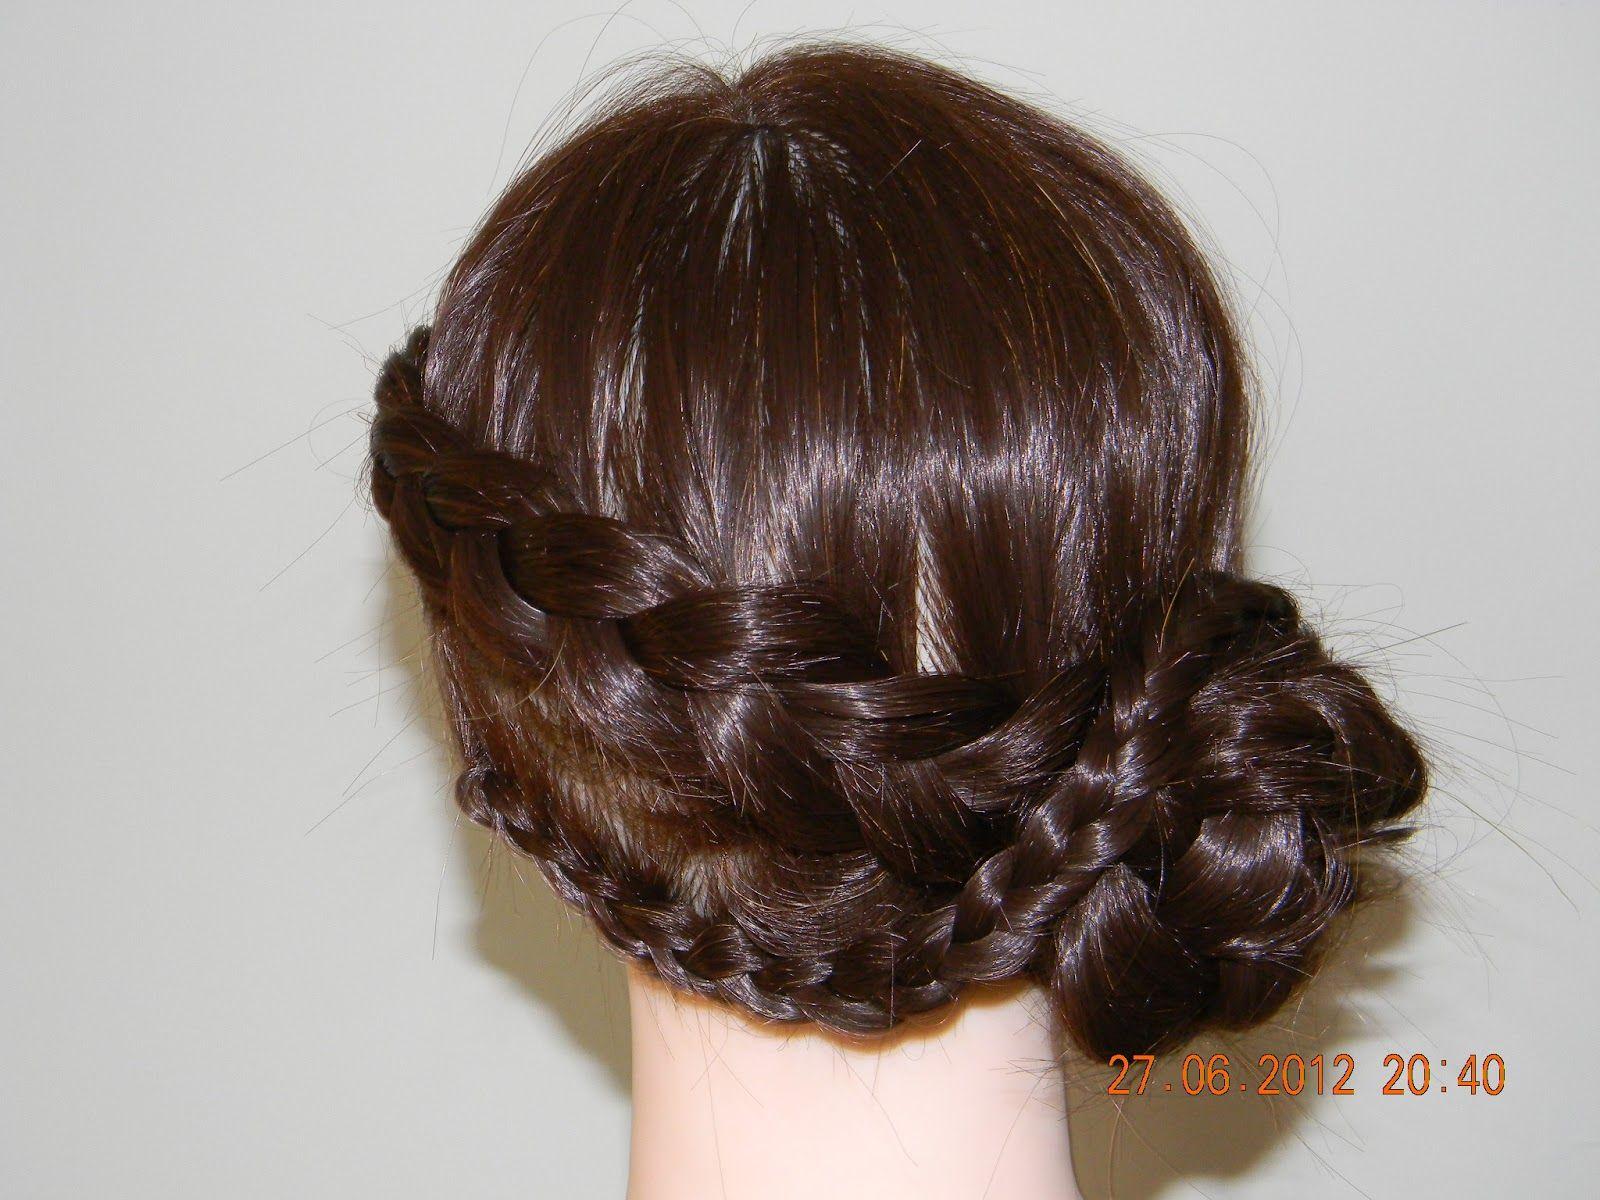 Fancy glam wedding go for braided bun everlasting hairstyle